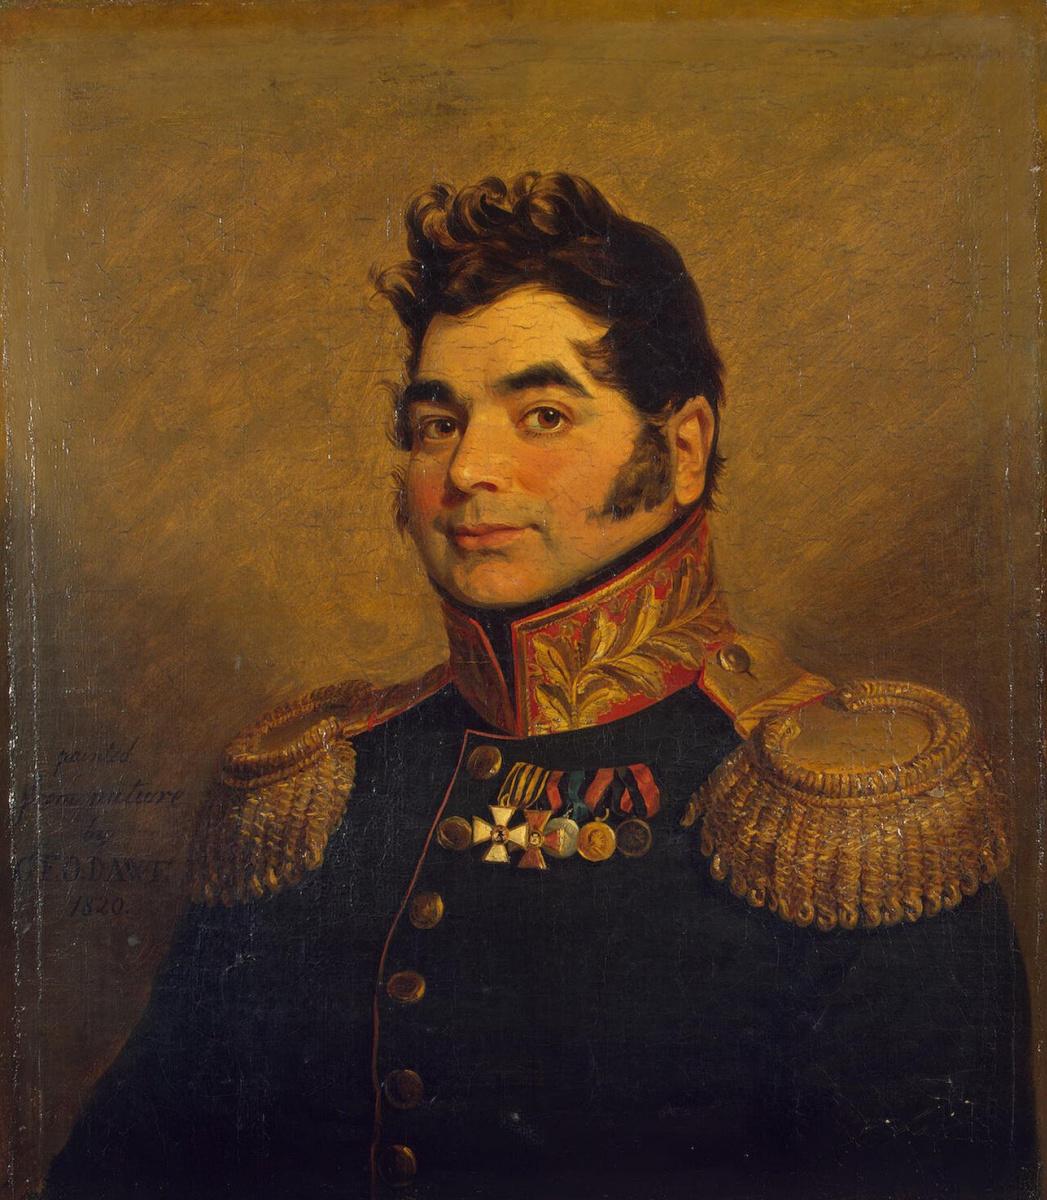 Джордж Доу. Портрет Дмитрия Михайловича Мордвинова